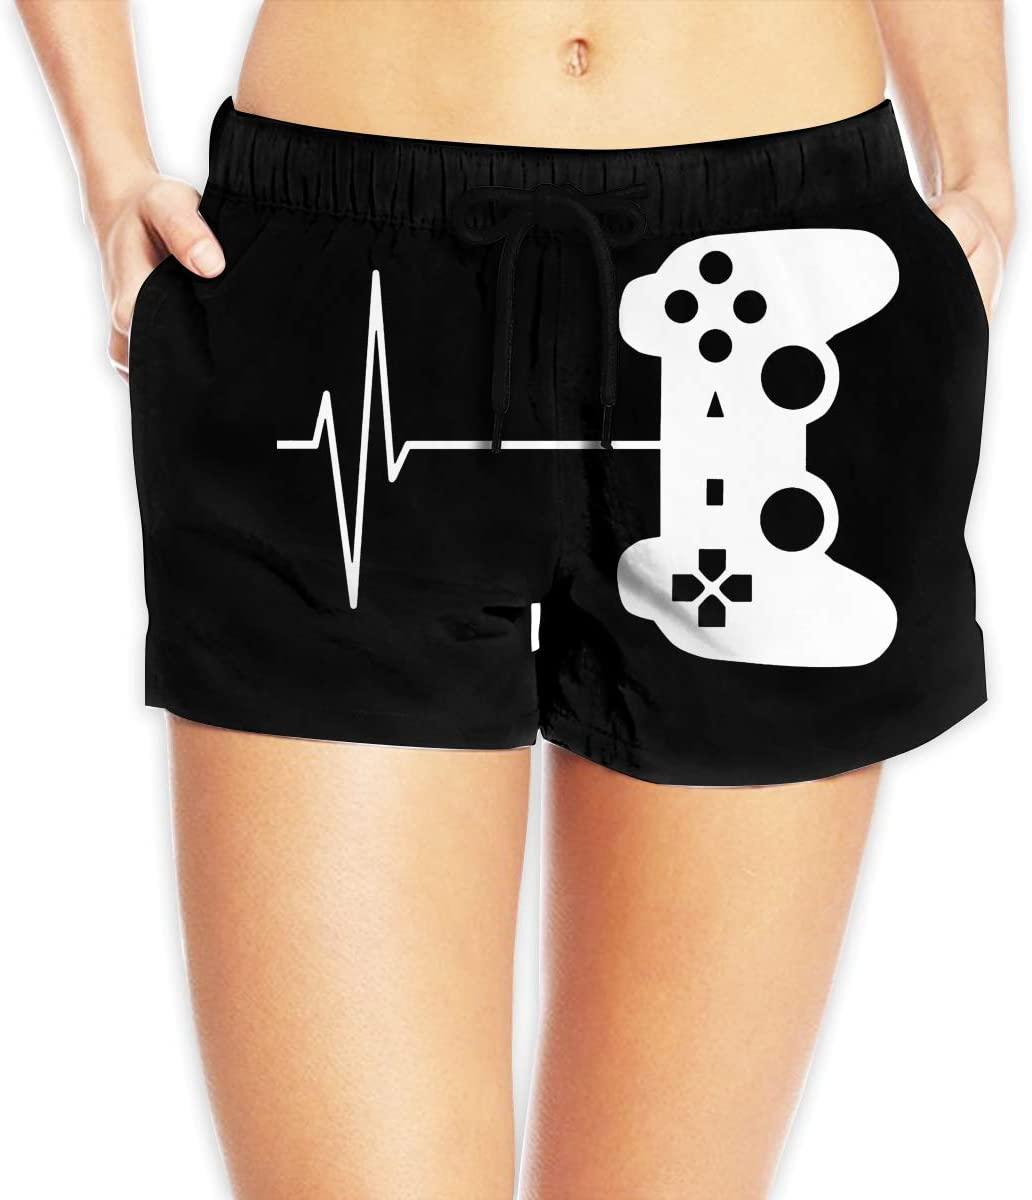 Hdecrr FFRE W Gamer Heartbeat Women's Shorts Summer Quick Dry Drawstring Elastic Waist Casual Pants